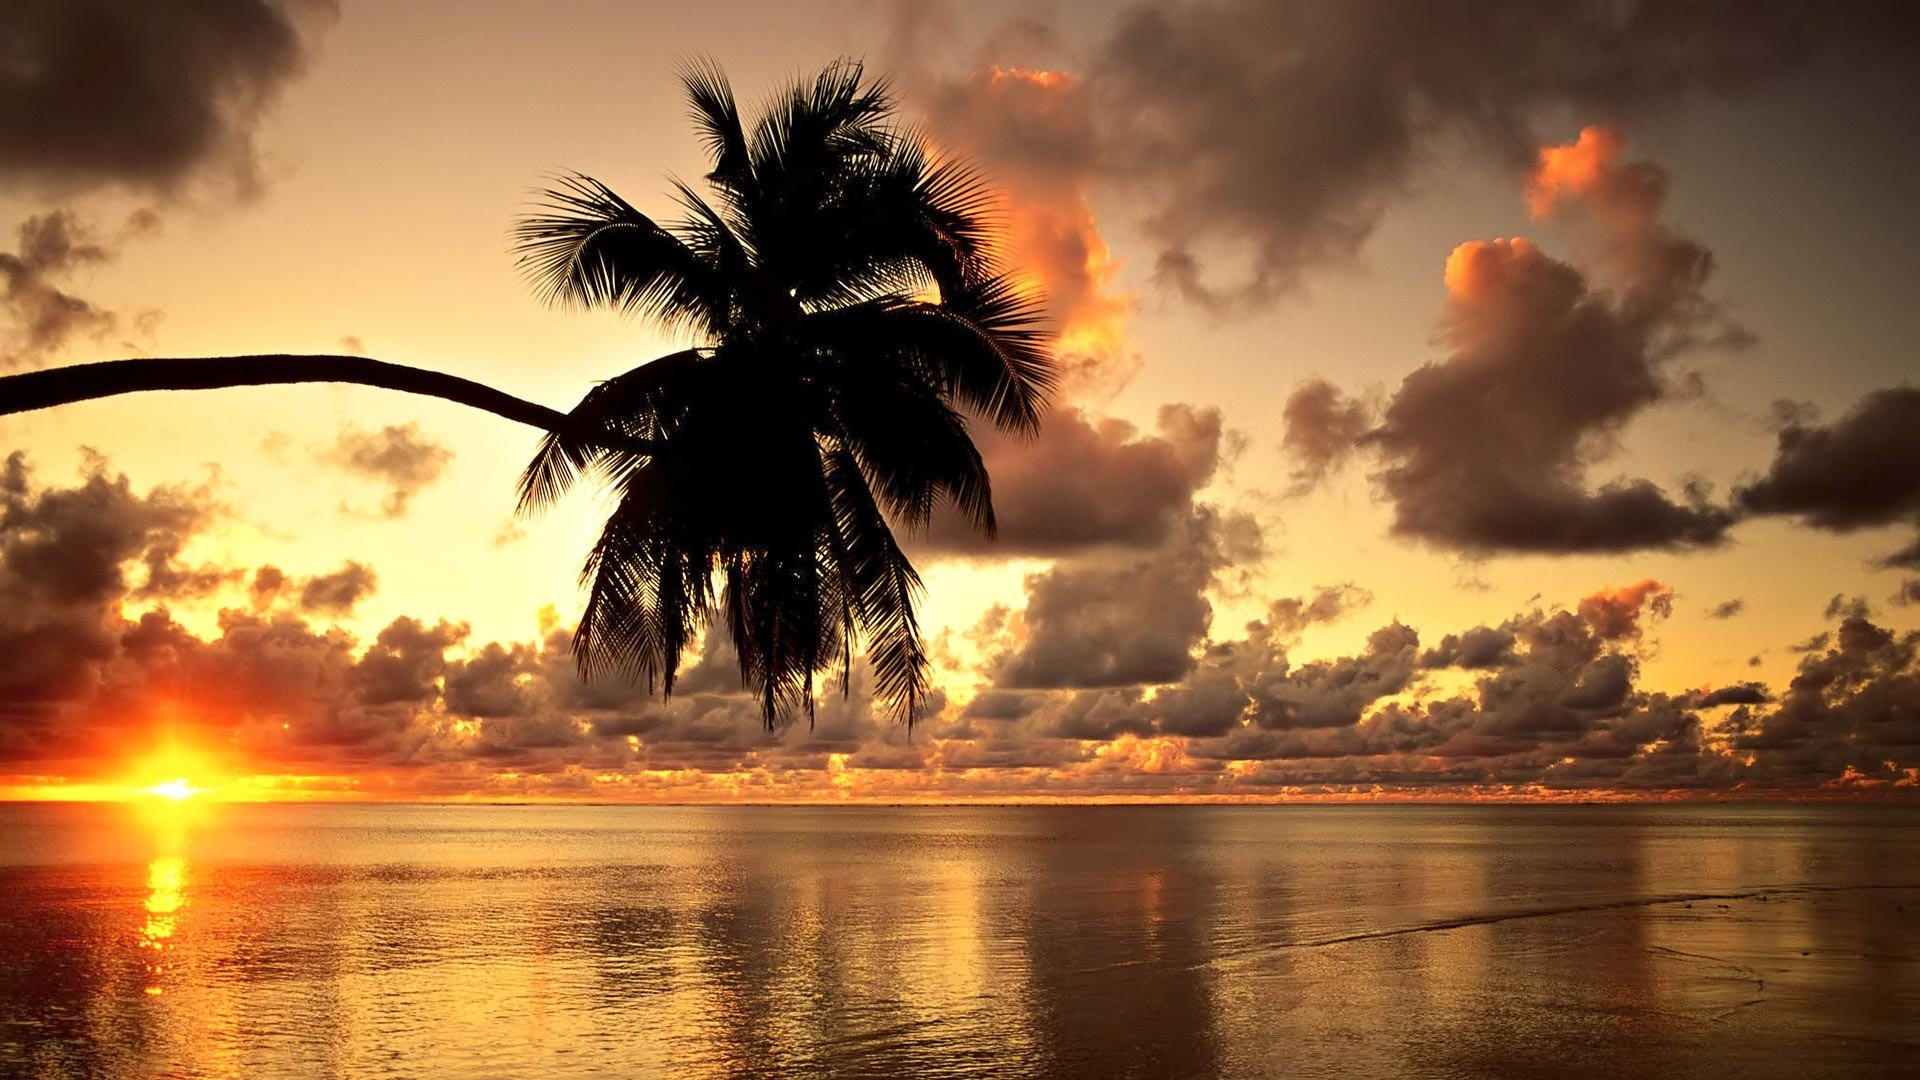 Hawaii, Beach, Sunset, Landscape, Clouds, Nature ...